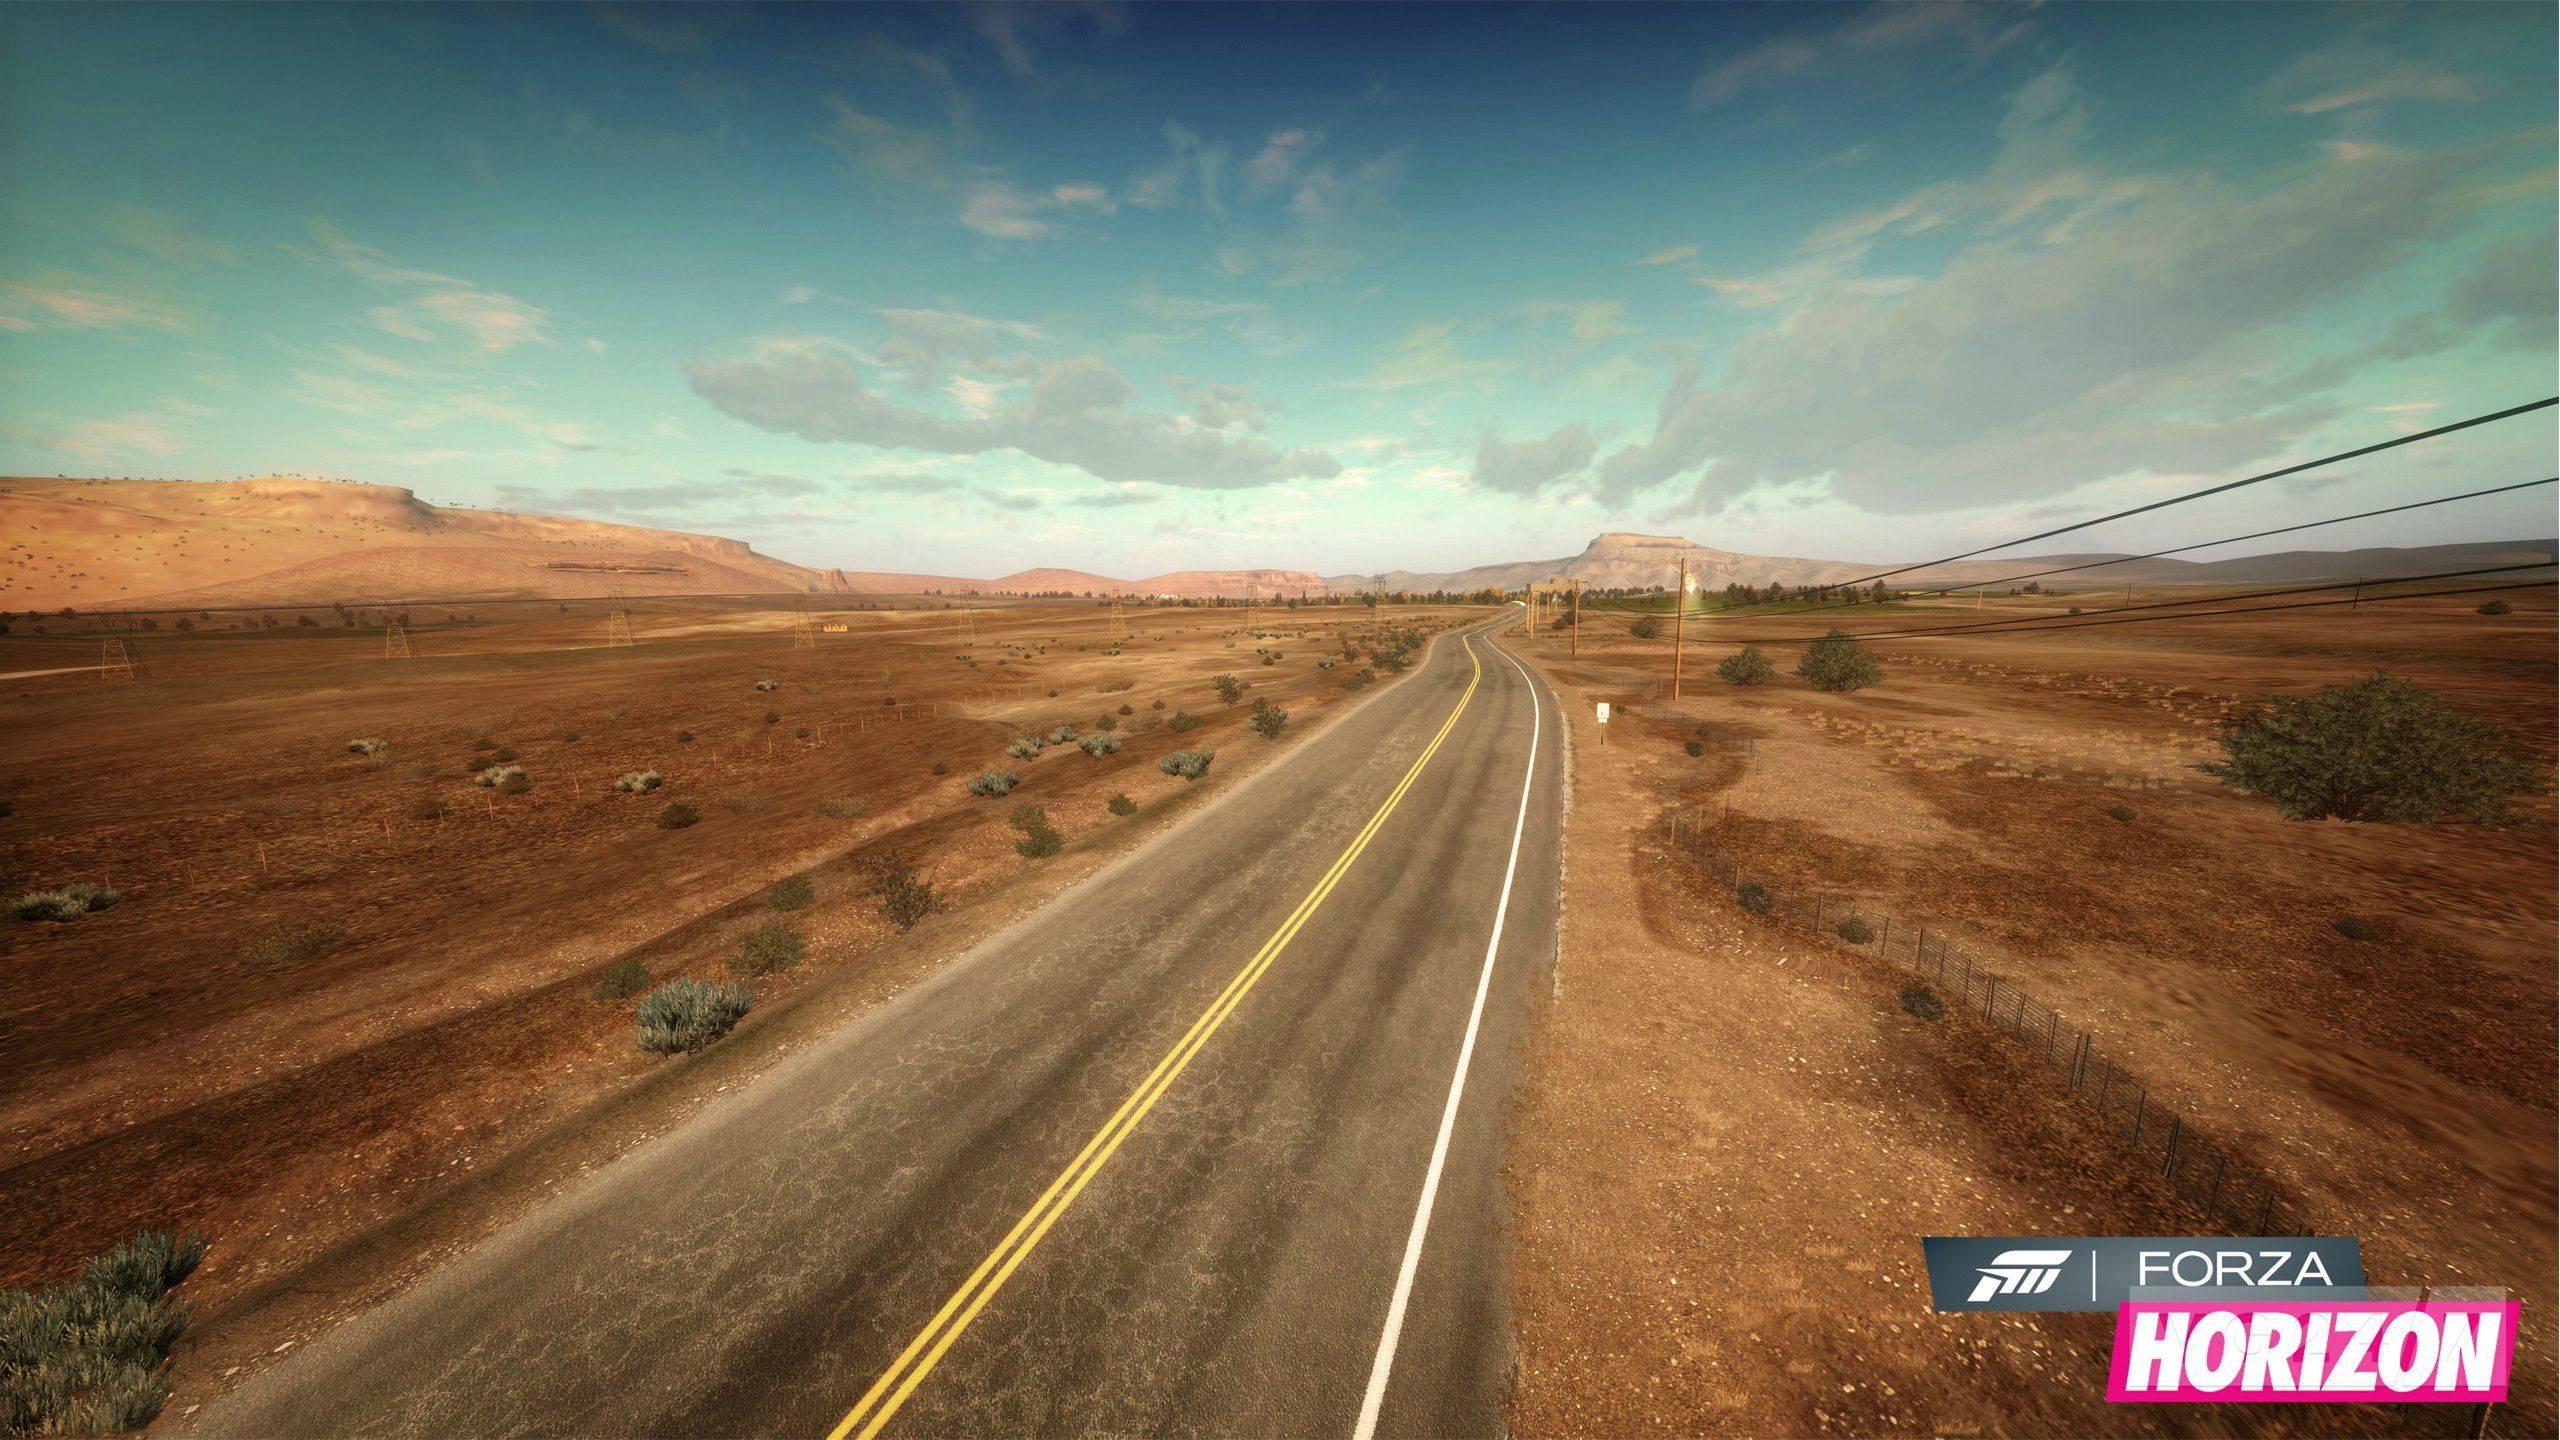 Forza Horizon Shots Details Surface Ahead Of E3 VG247